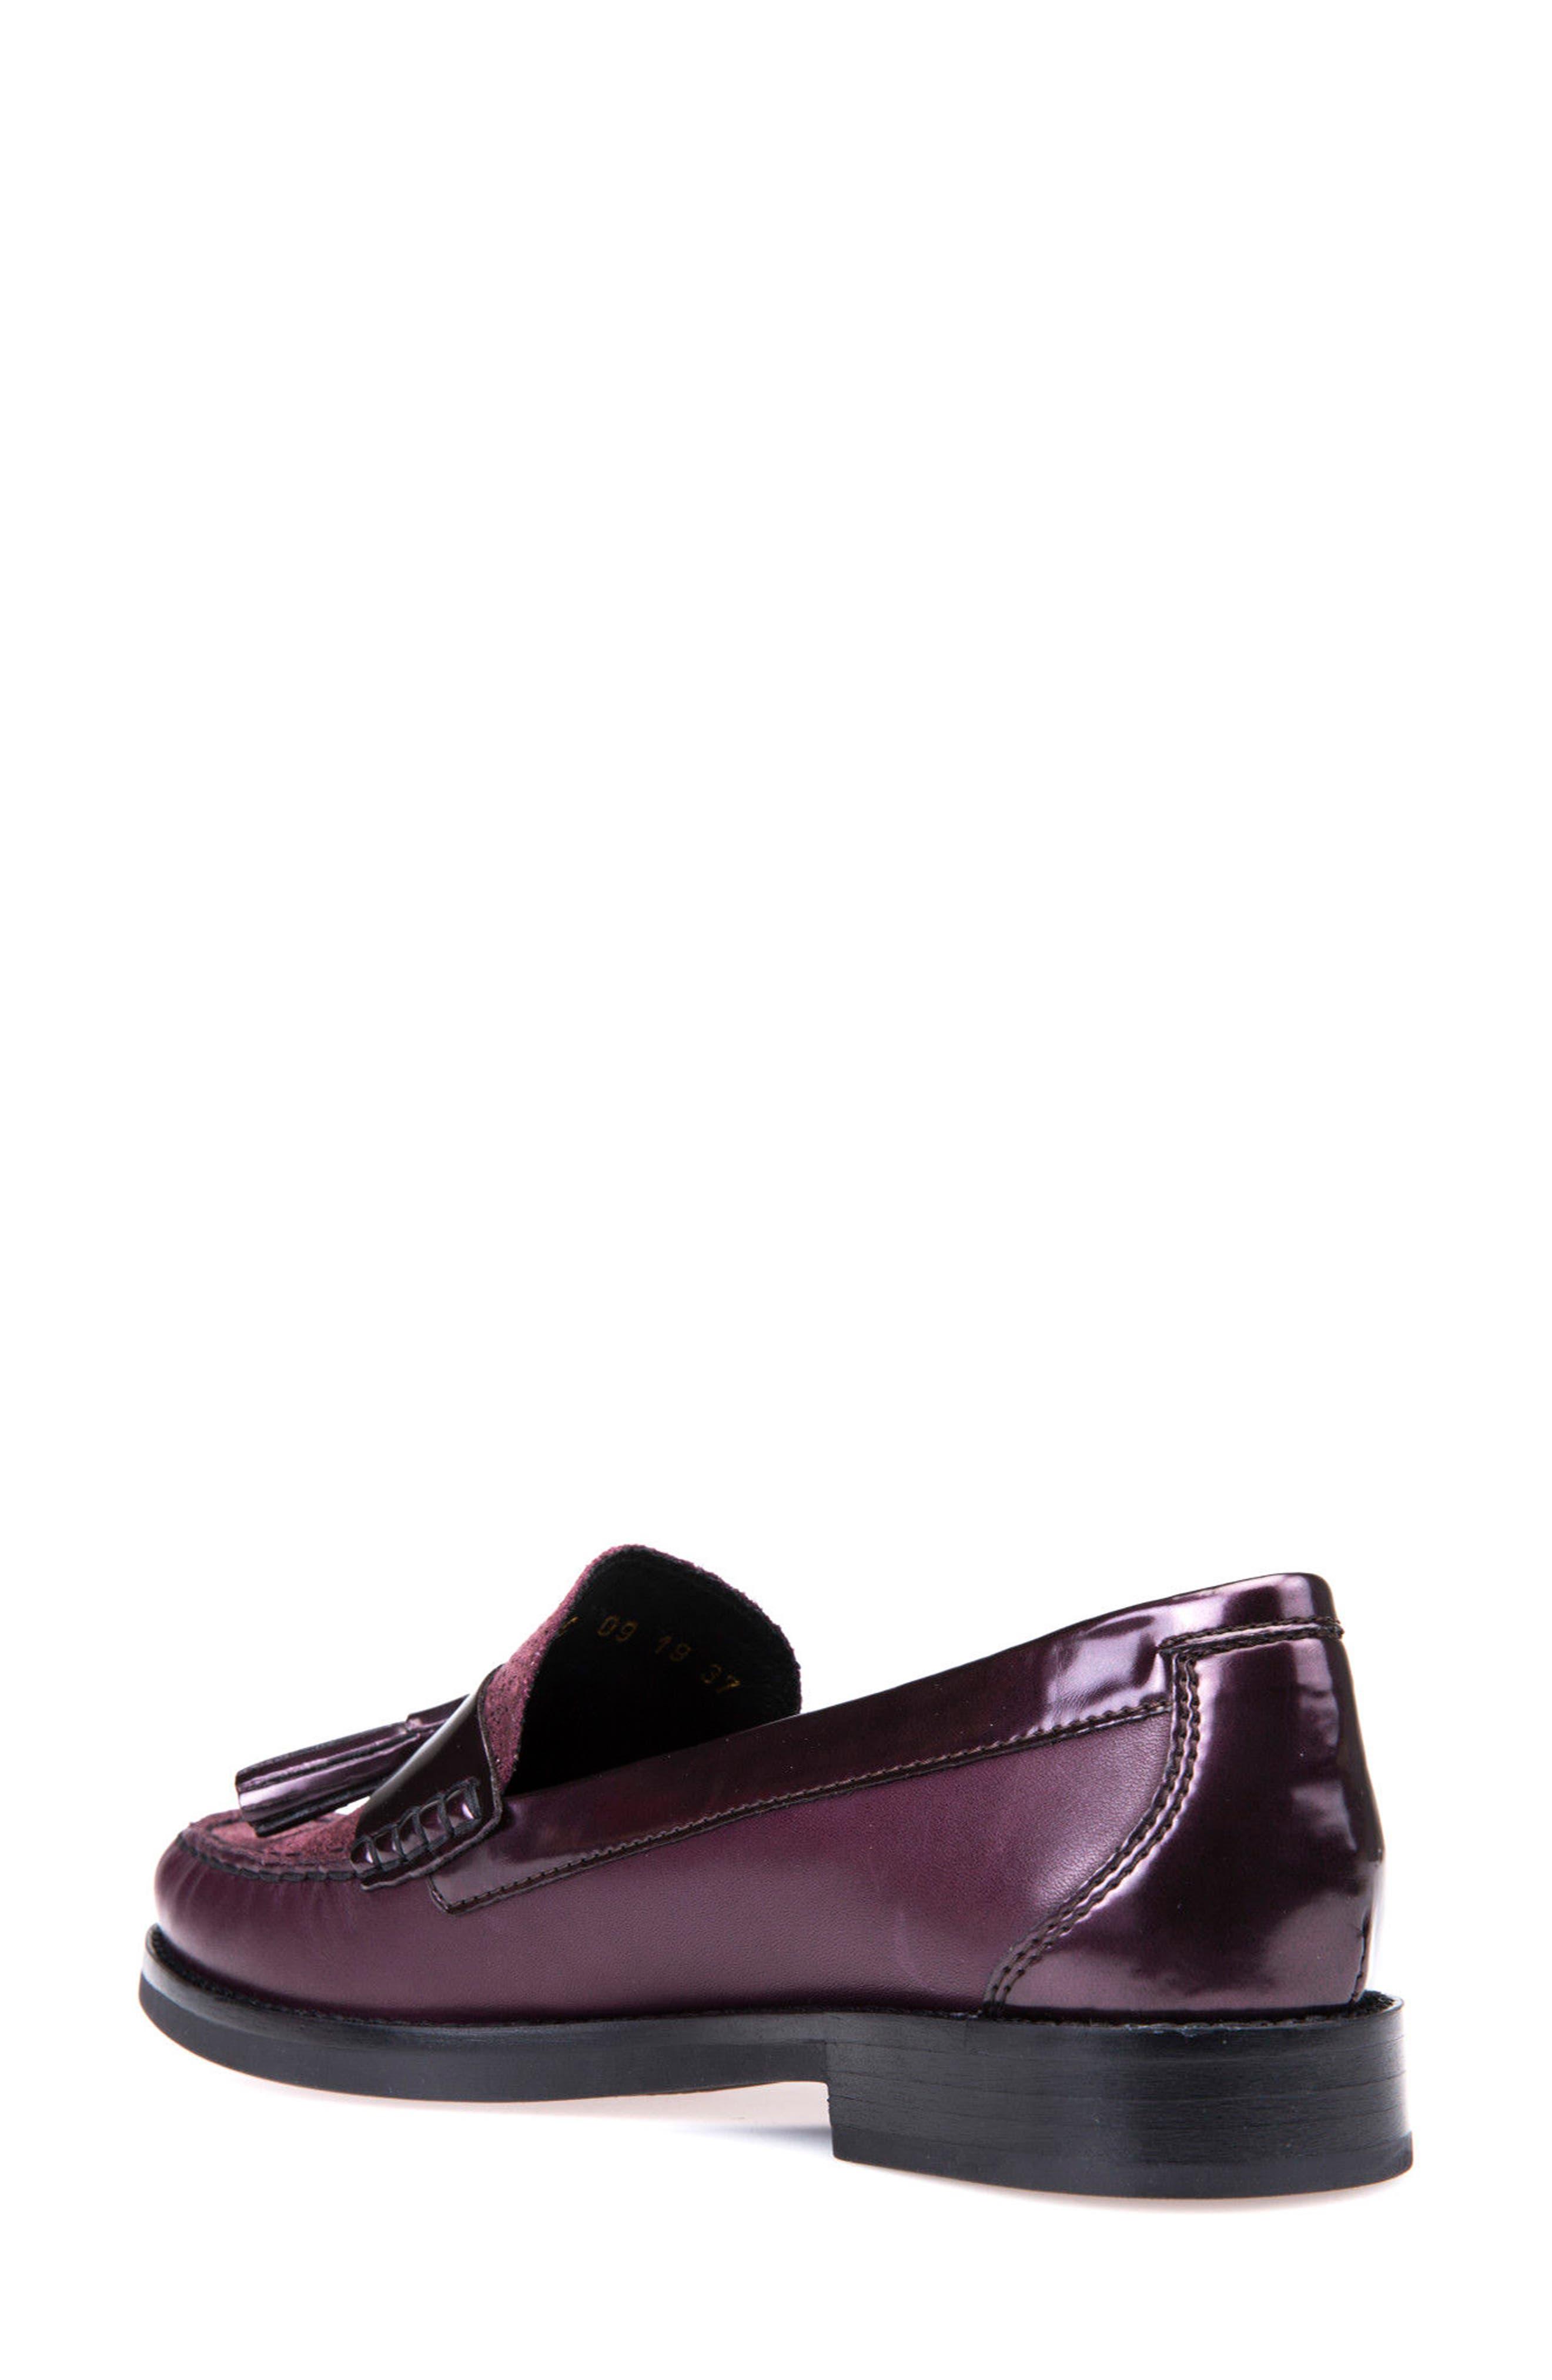 Promethea Loafer,                             Alternate thumbnail 2, color,                             Prune Leather